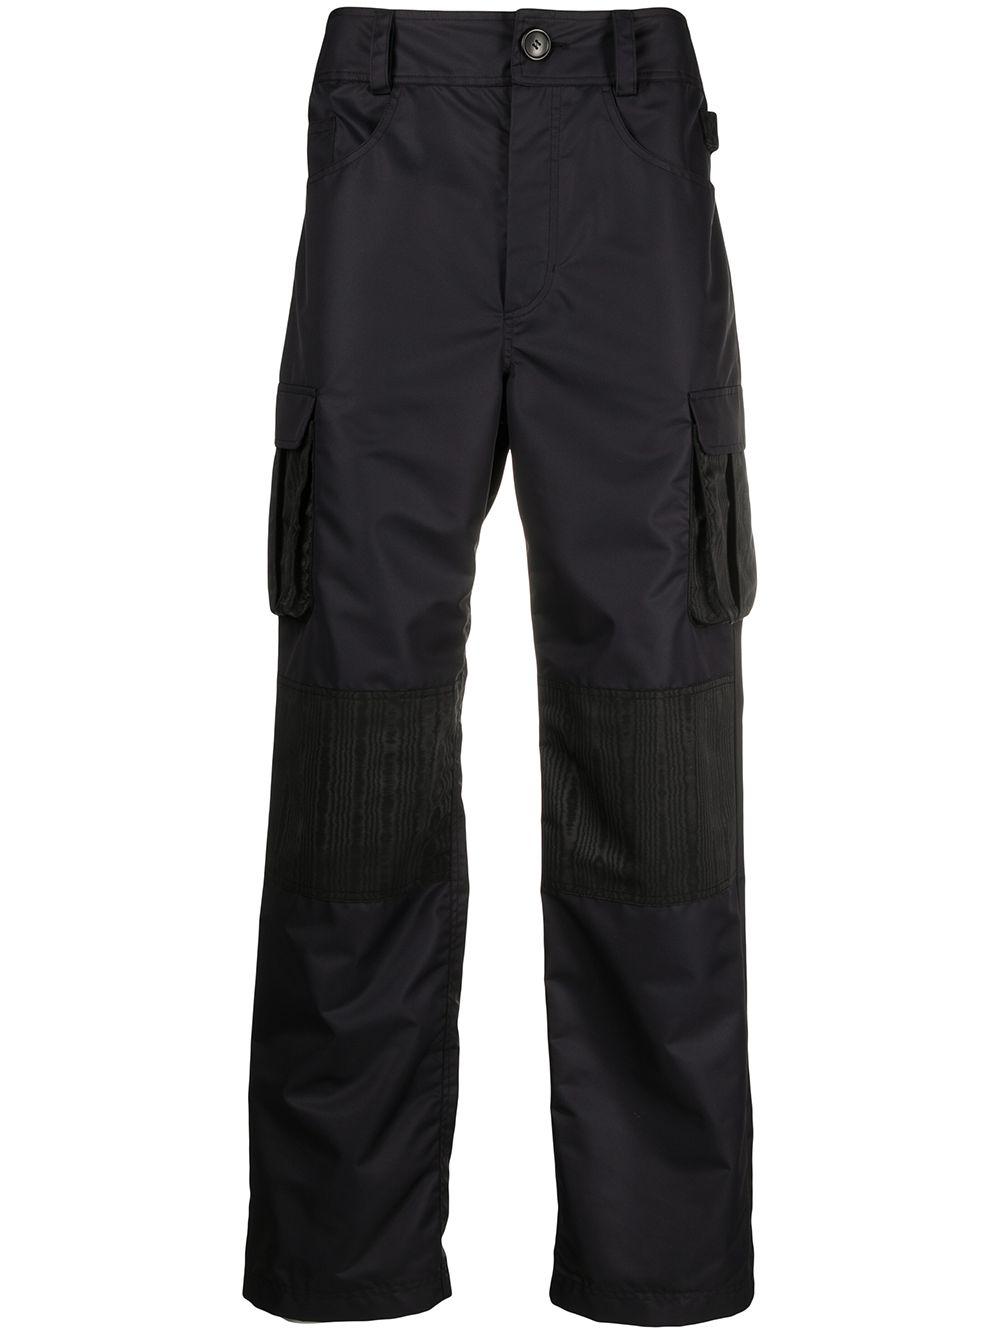 Marine Serre pantalone cargo uomo MARINE SERRE | Pantaloni | P081SS21M-WOTPA00000